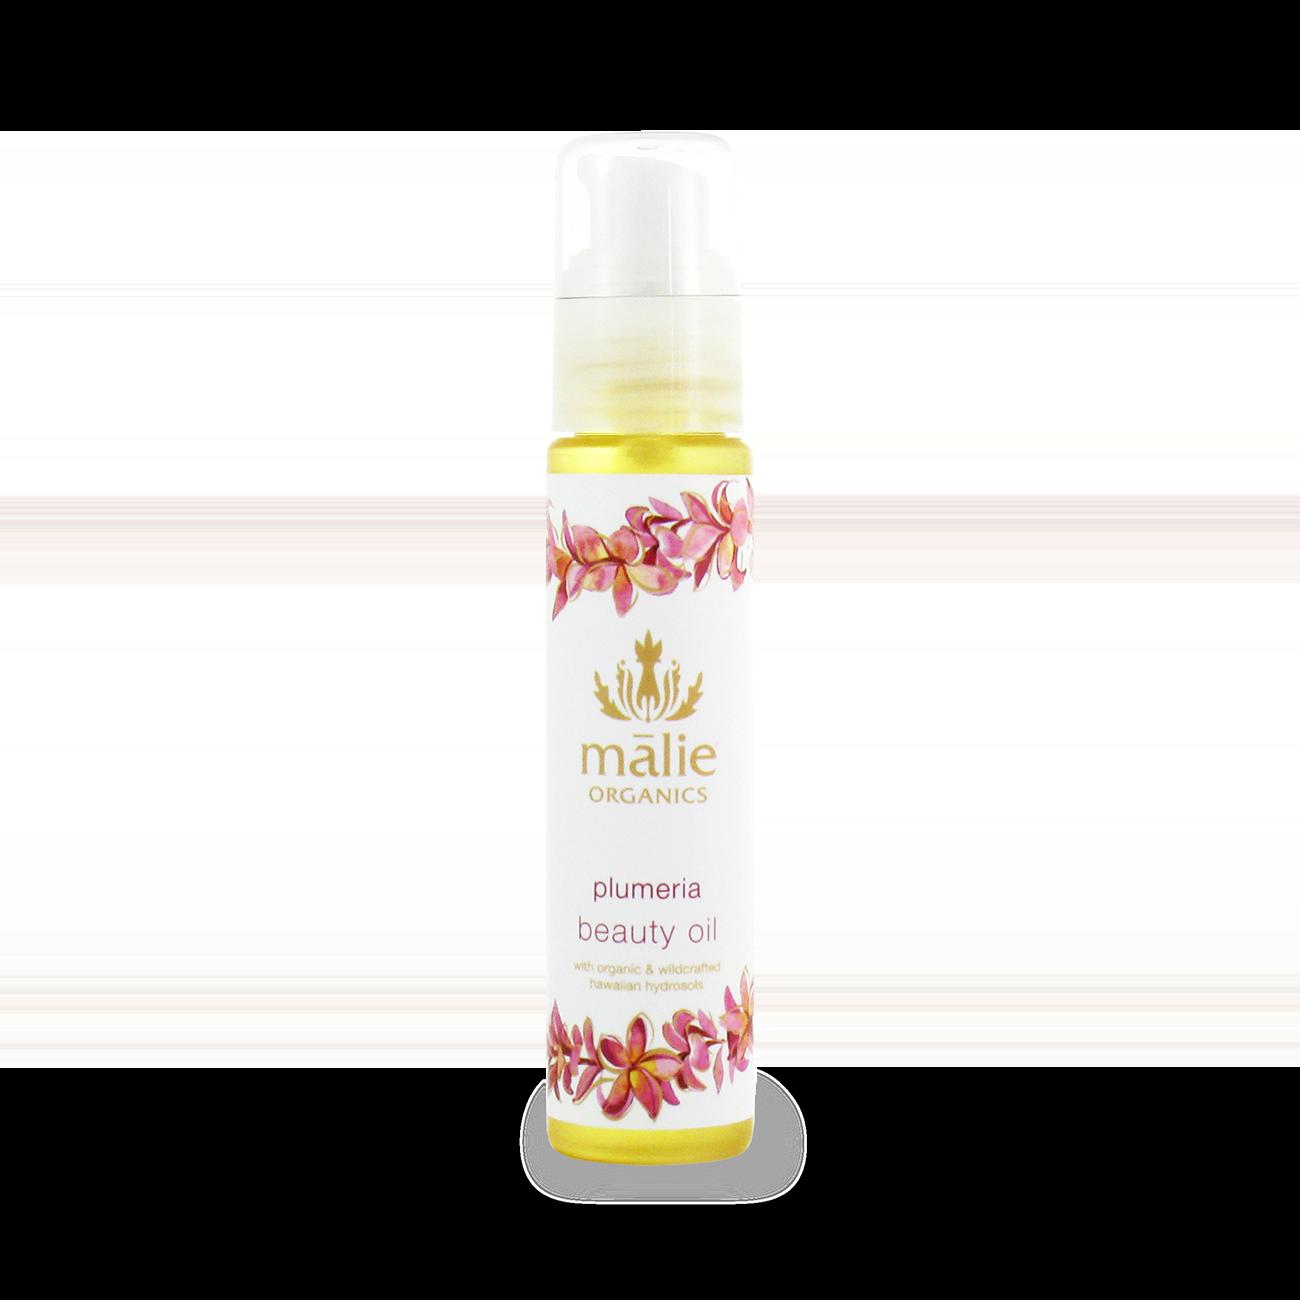 Plumeria Beauty Oil